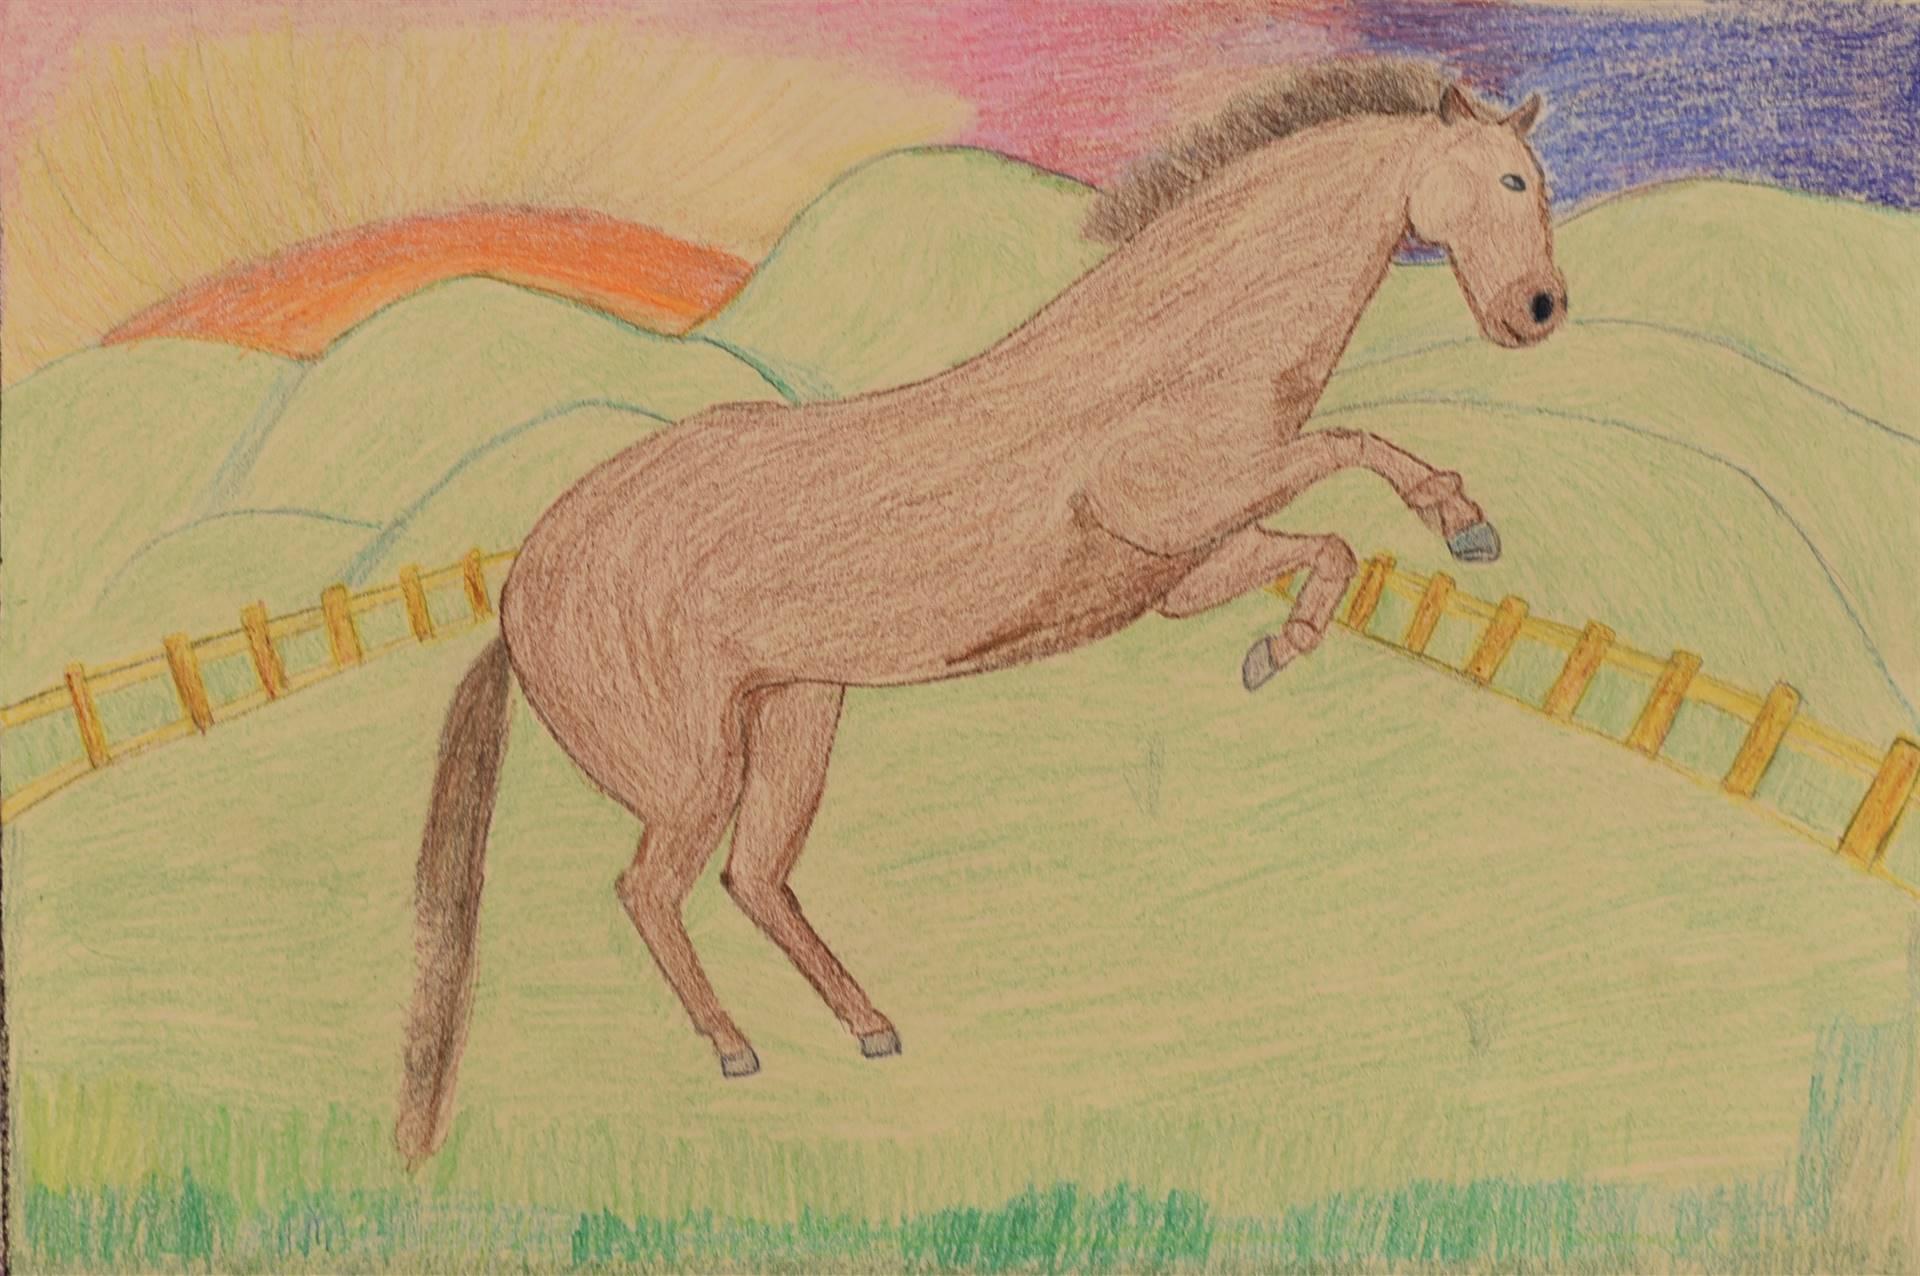 Brecksville-Broadview Hts. Middle School Art Projects 100